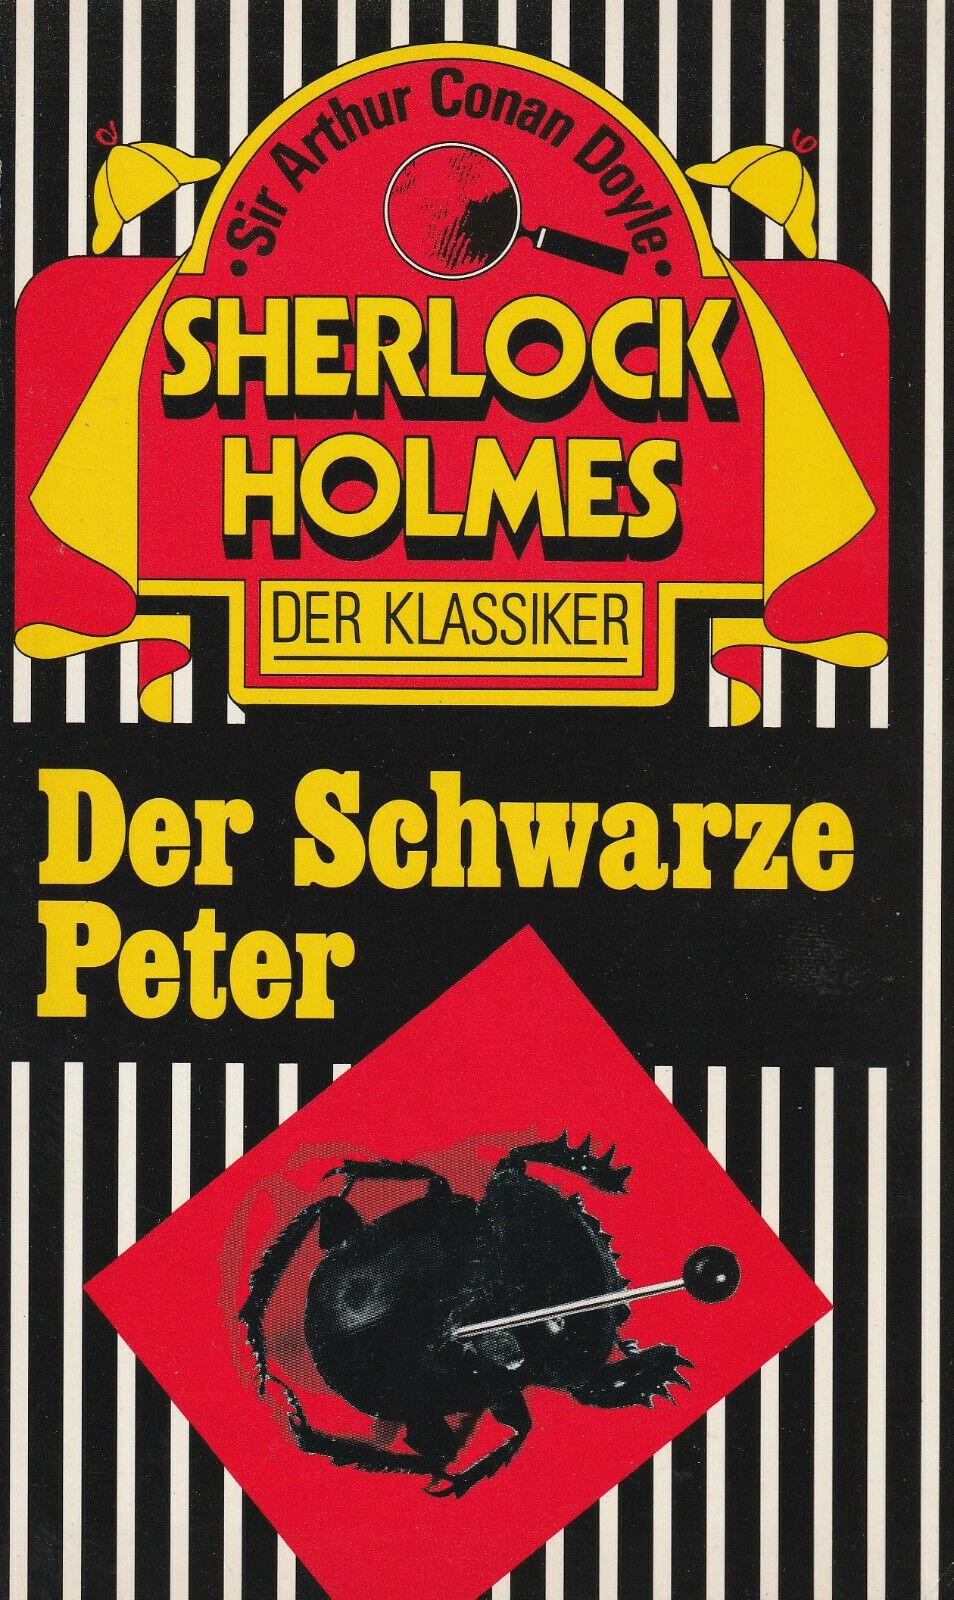 SHERLOCK HOLMES - Der Schwarze Peter - Sir Arthur Conan Doyle - TB